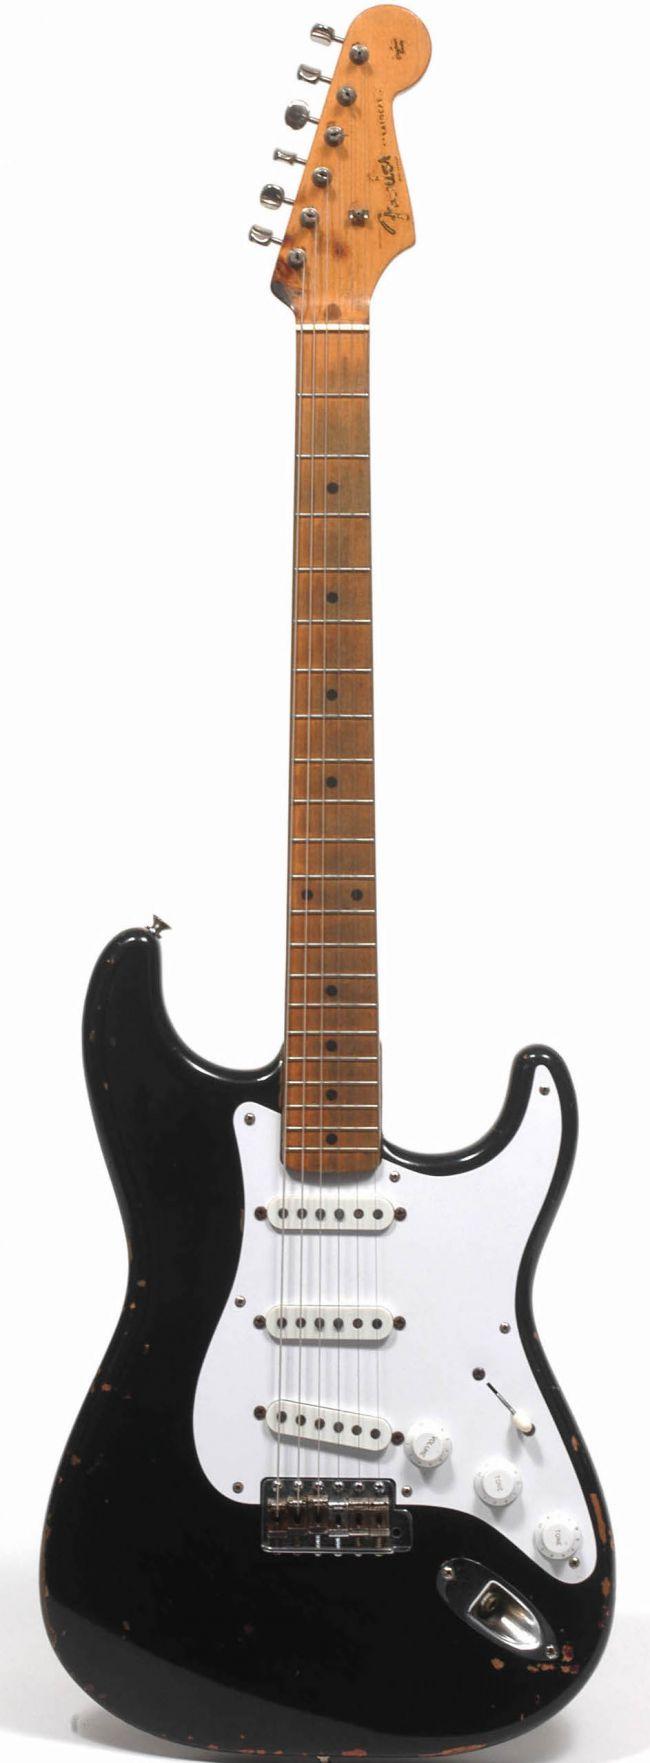 Eric Clapton_Blackie_FUCF4HngXd5HKWrjcHEQ4m-650-80